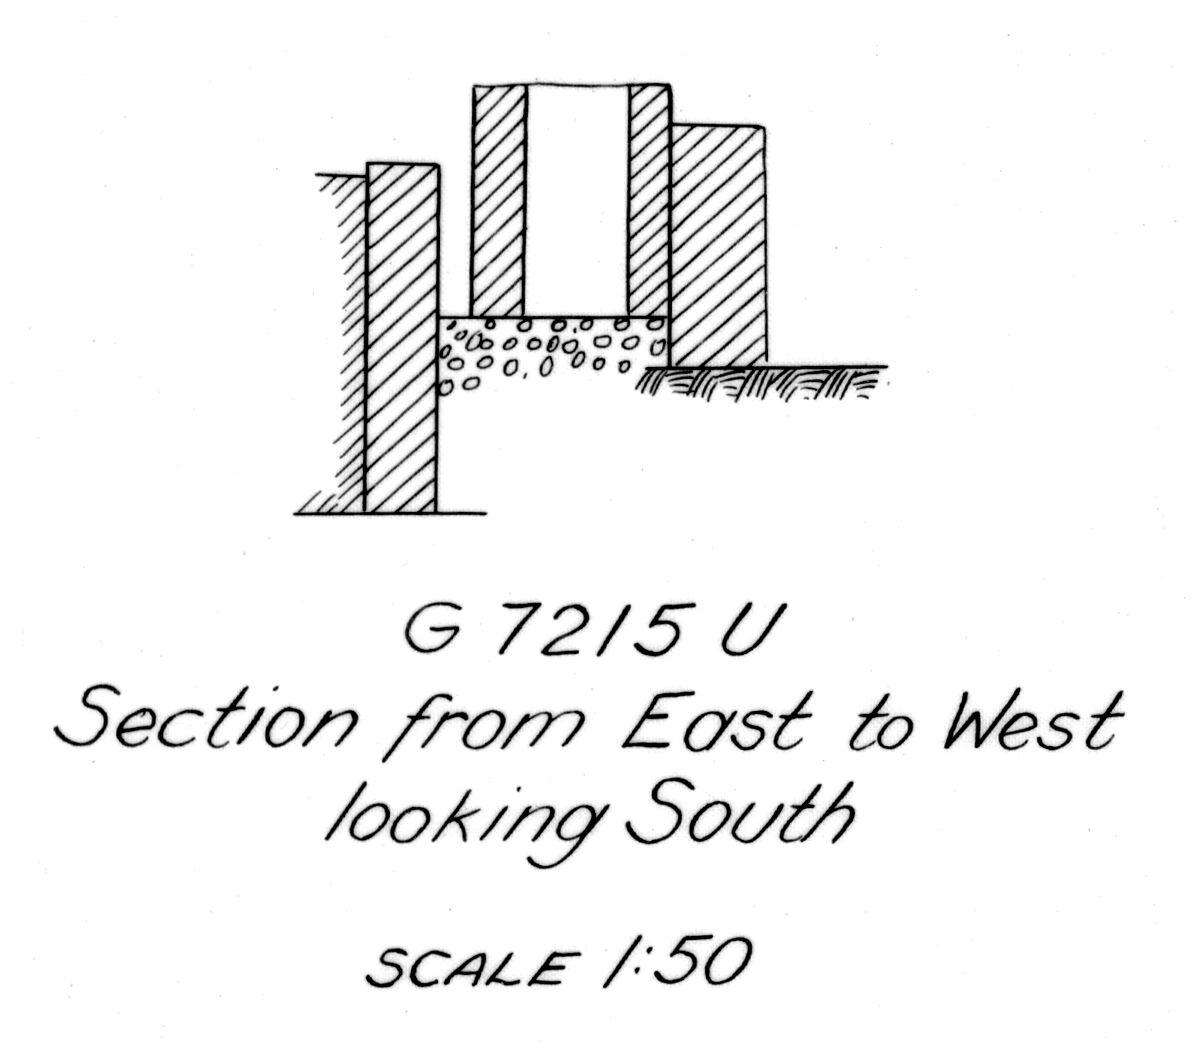 Maps and plans: G 7215, Shaft U